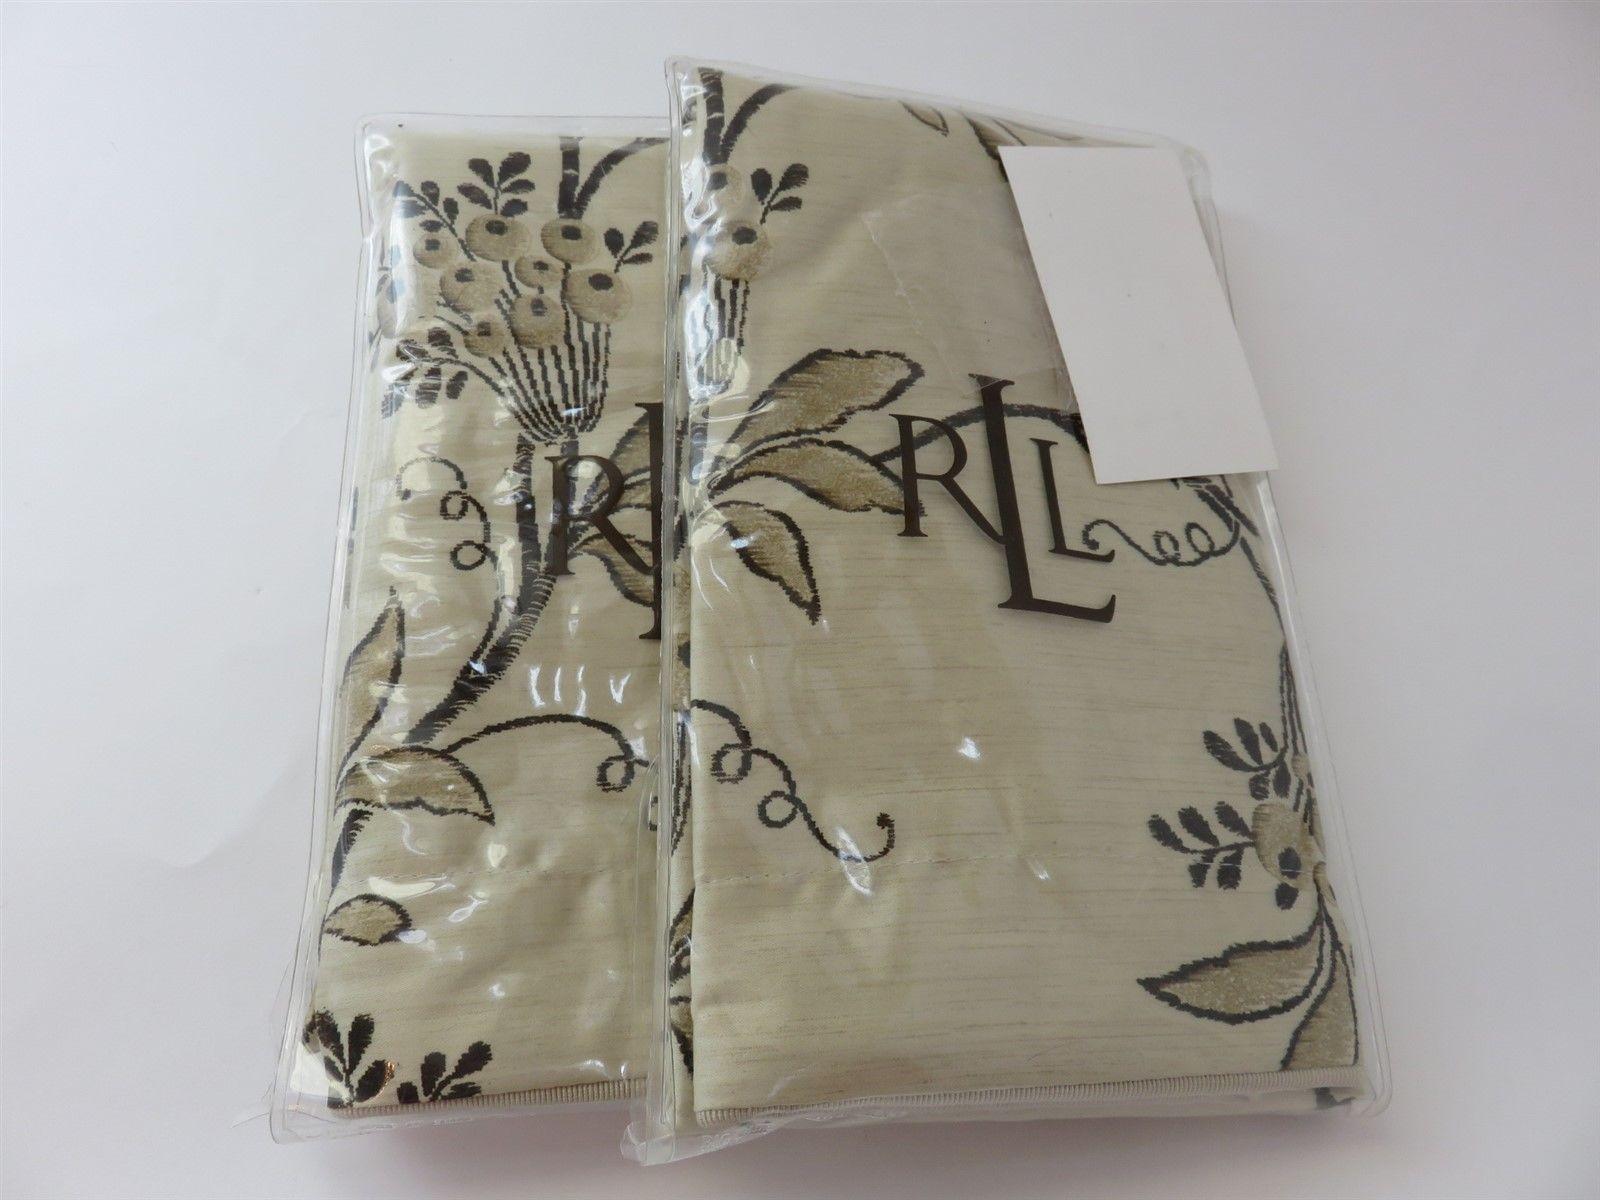 Ralph Lauren Port Palace EURO Pillow Shams Pair  Black and White Floral